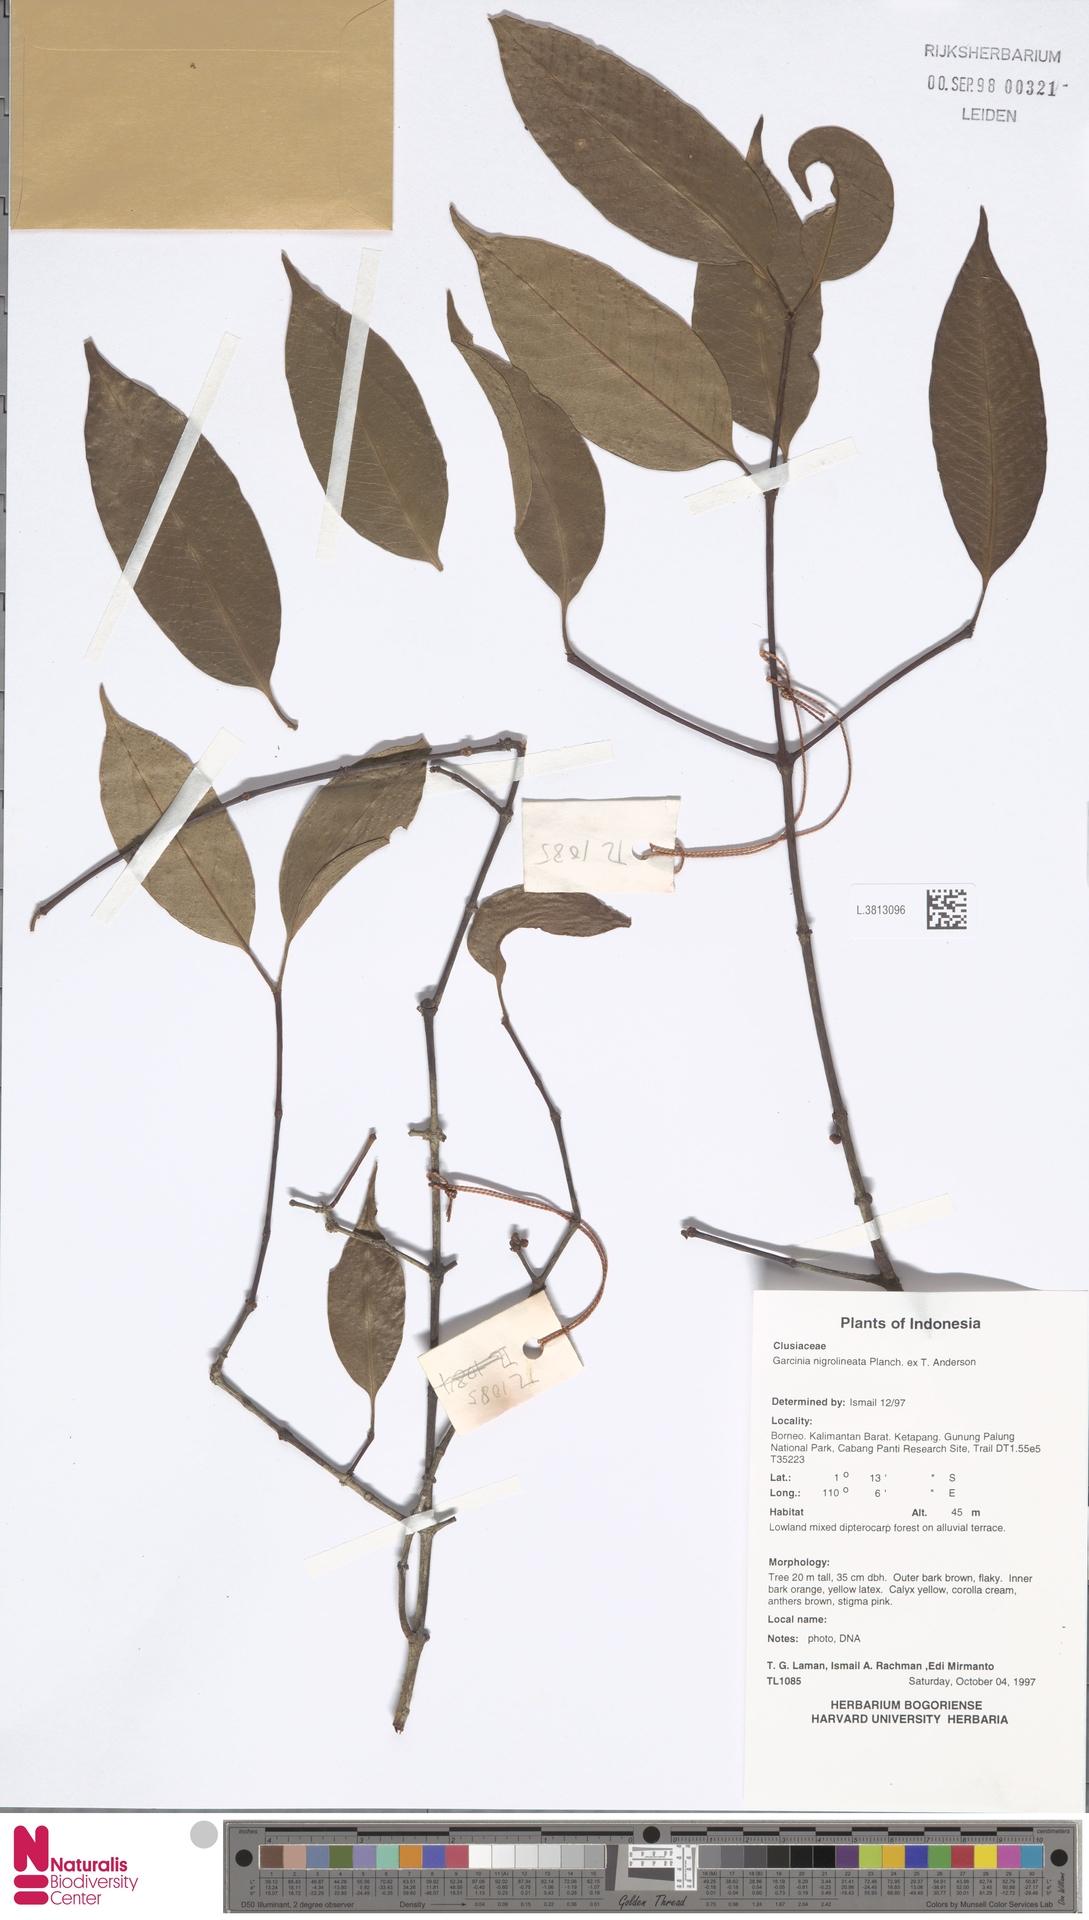 L.3813096 | Garcinia nigrolineata Planch. ex T.Anderson